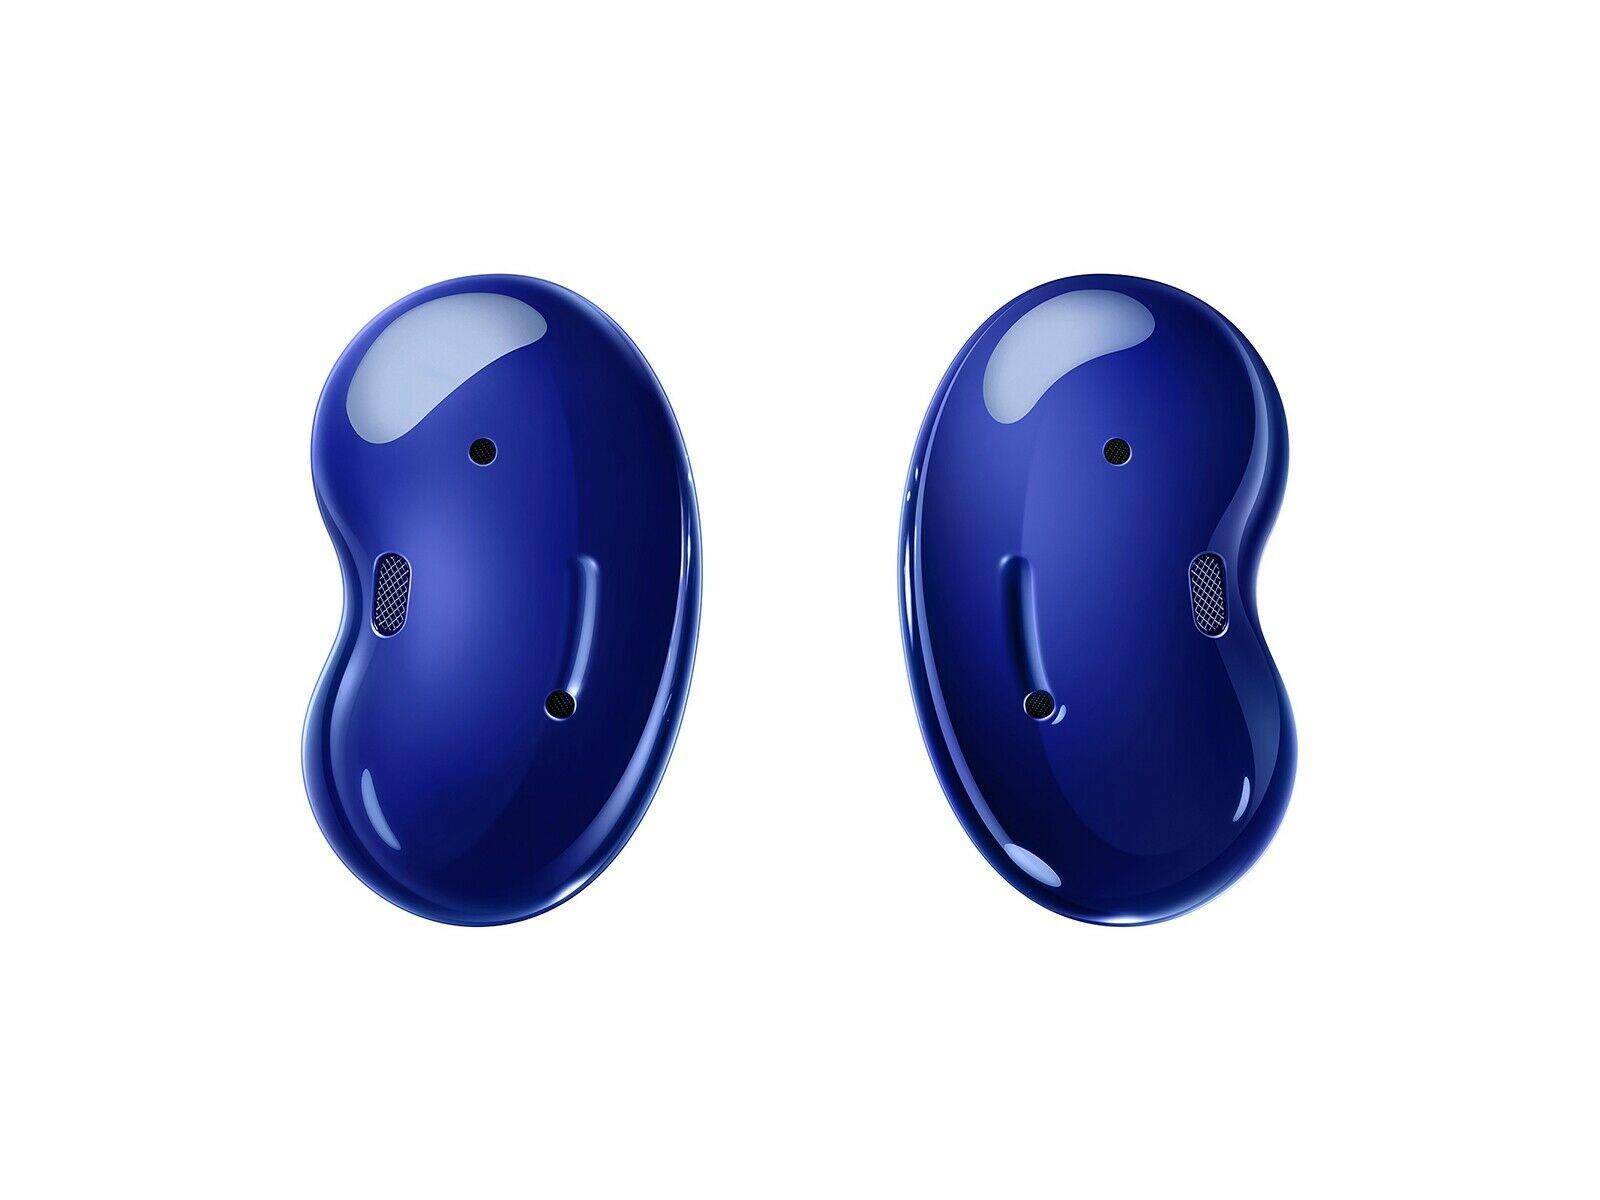 Samsung Galaxy Buds Live Wireless Headset $69.99 at Ebay